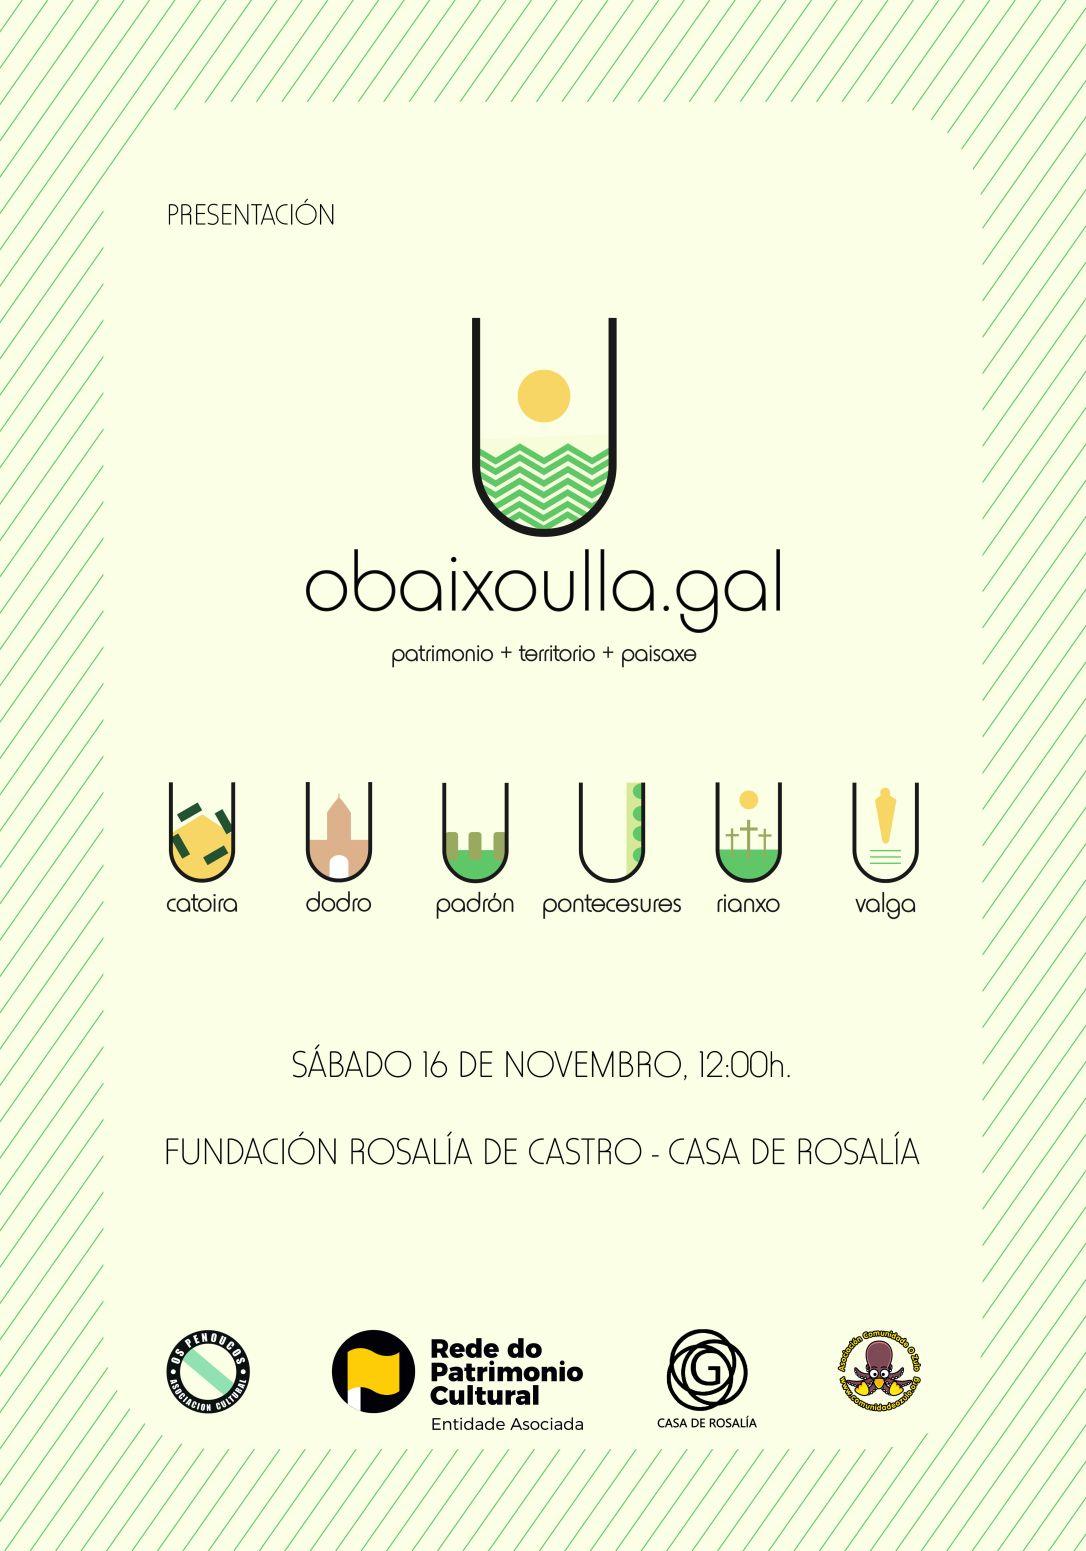 cartel_obaixoulla.gal